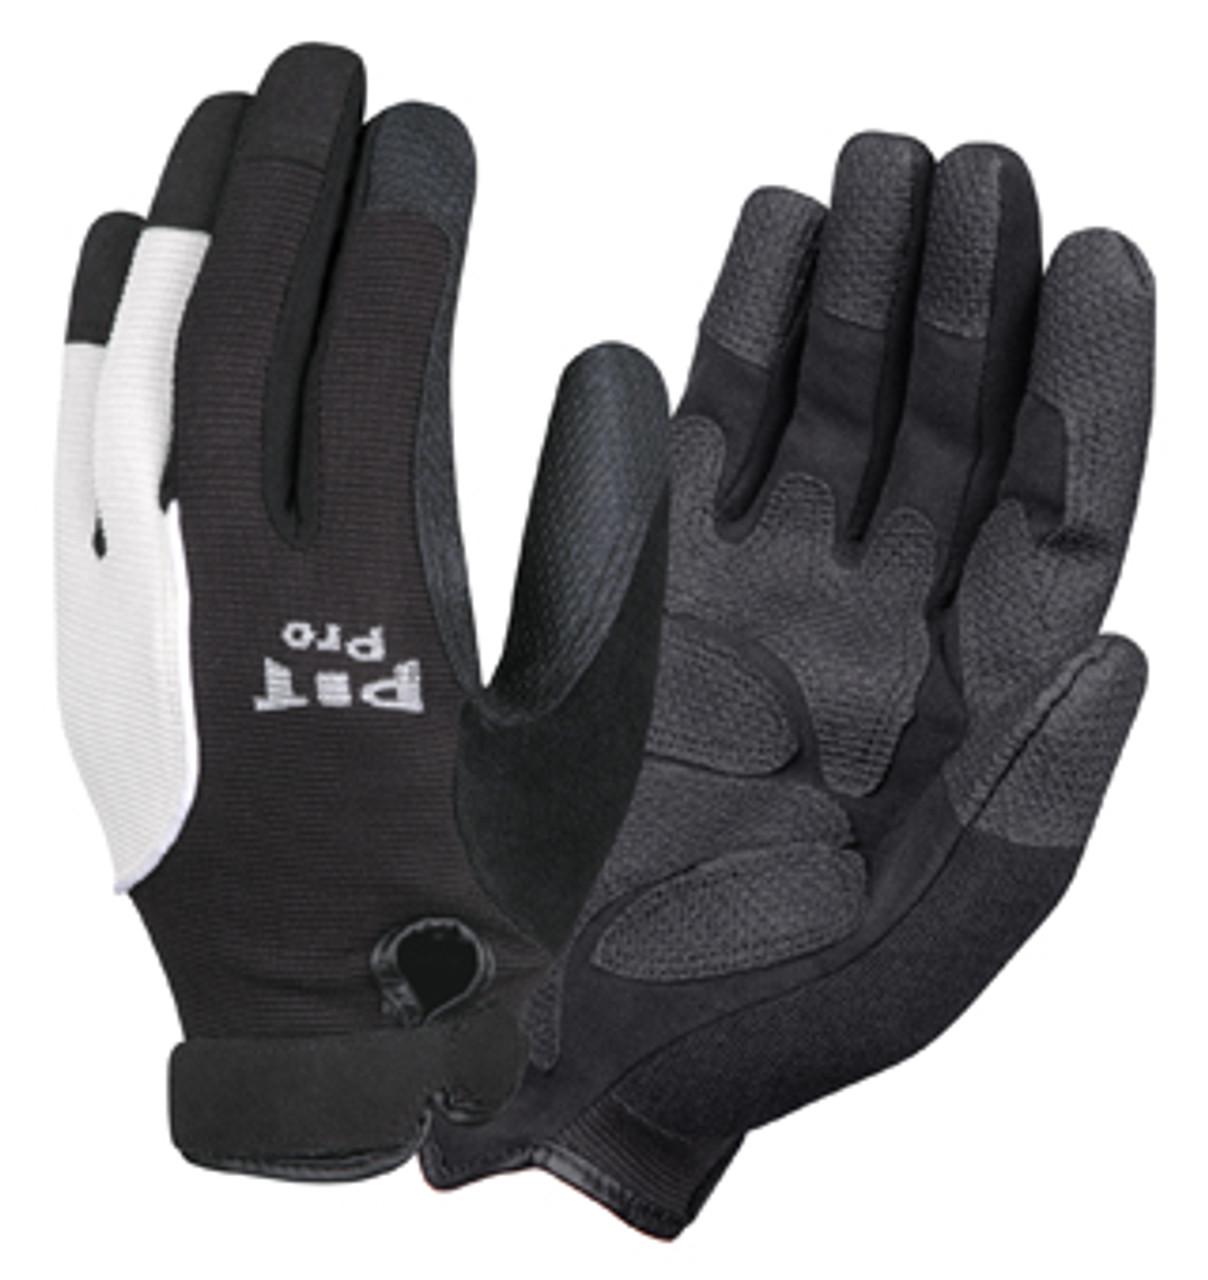 77671: Pit Pro Black Reinforced Palm/Black & White Back Gloves